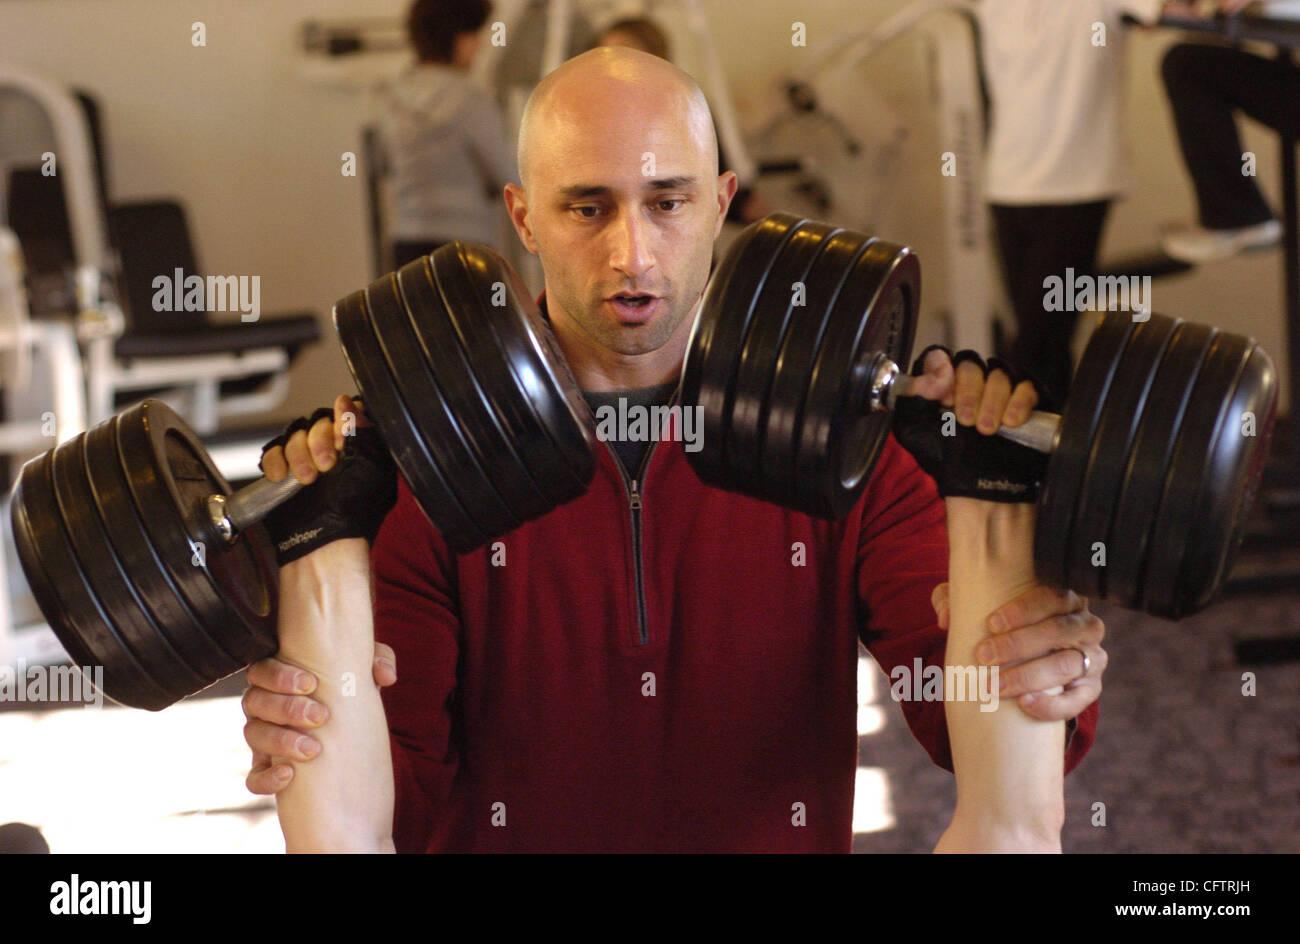 Personal trainer Brian Rivera helps his client, Dan Martin